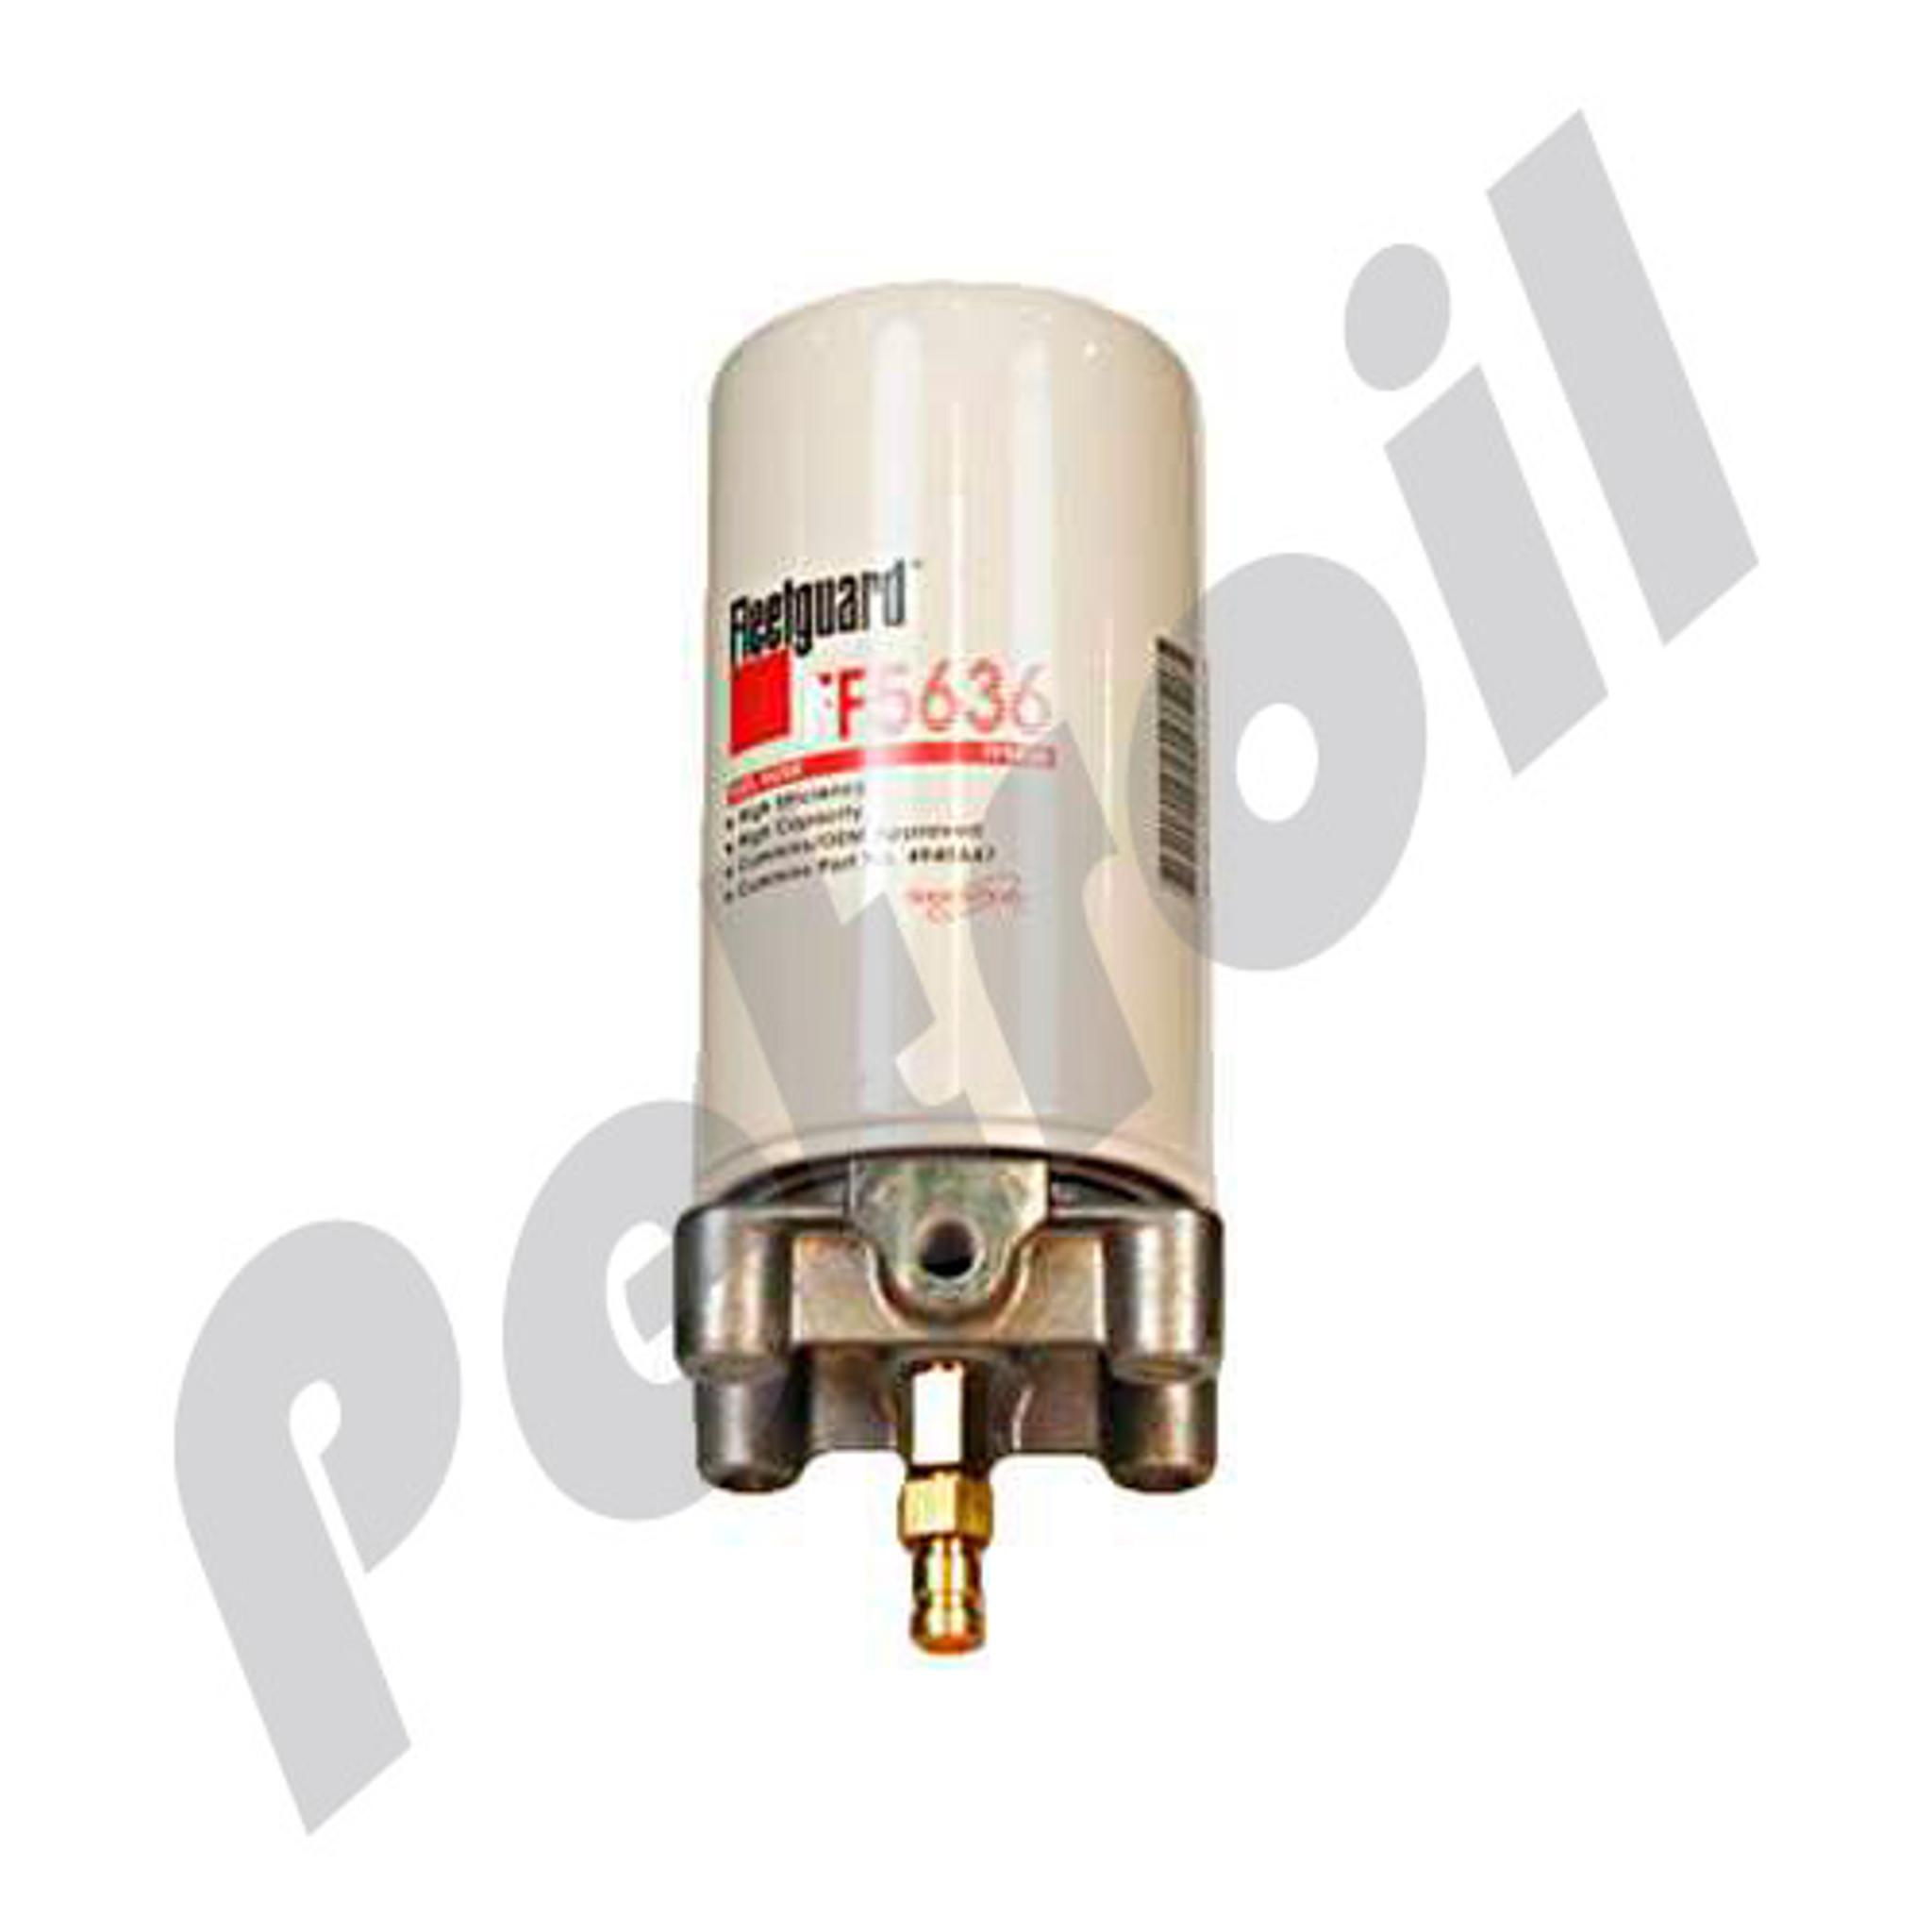 Fleetguard Fuel Filter Part # FF5686